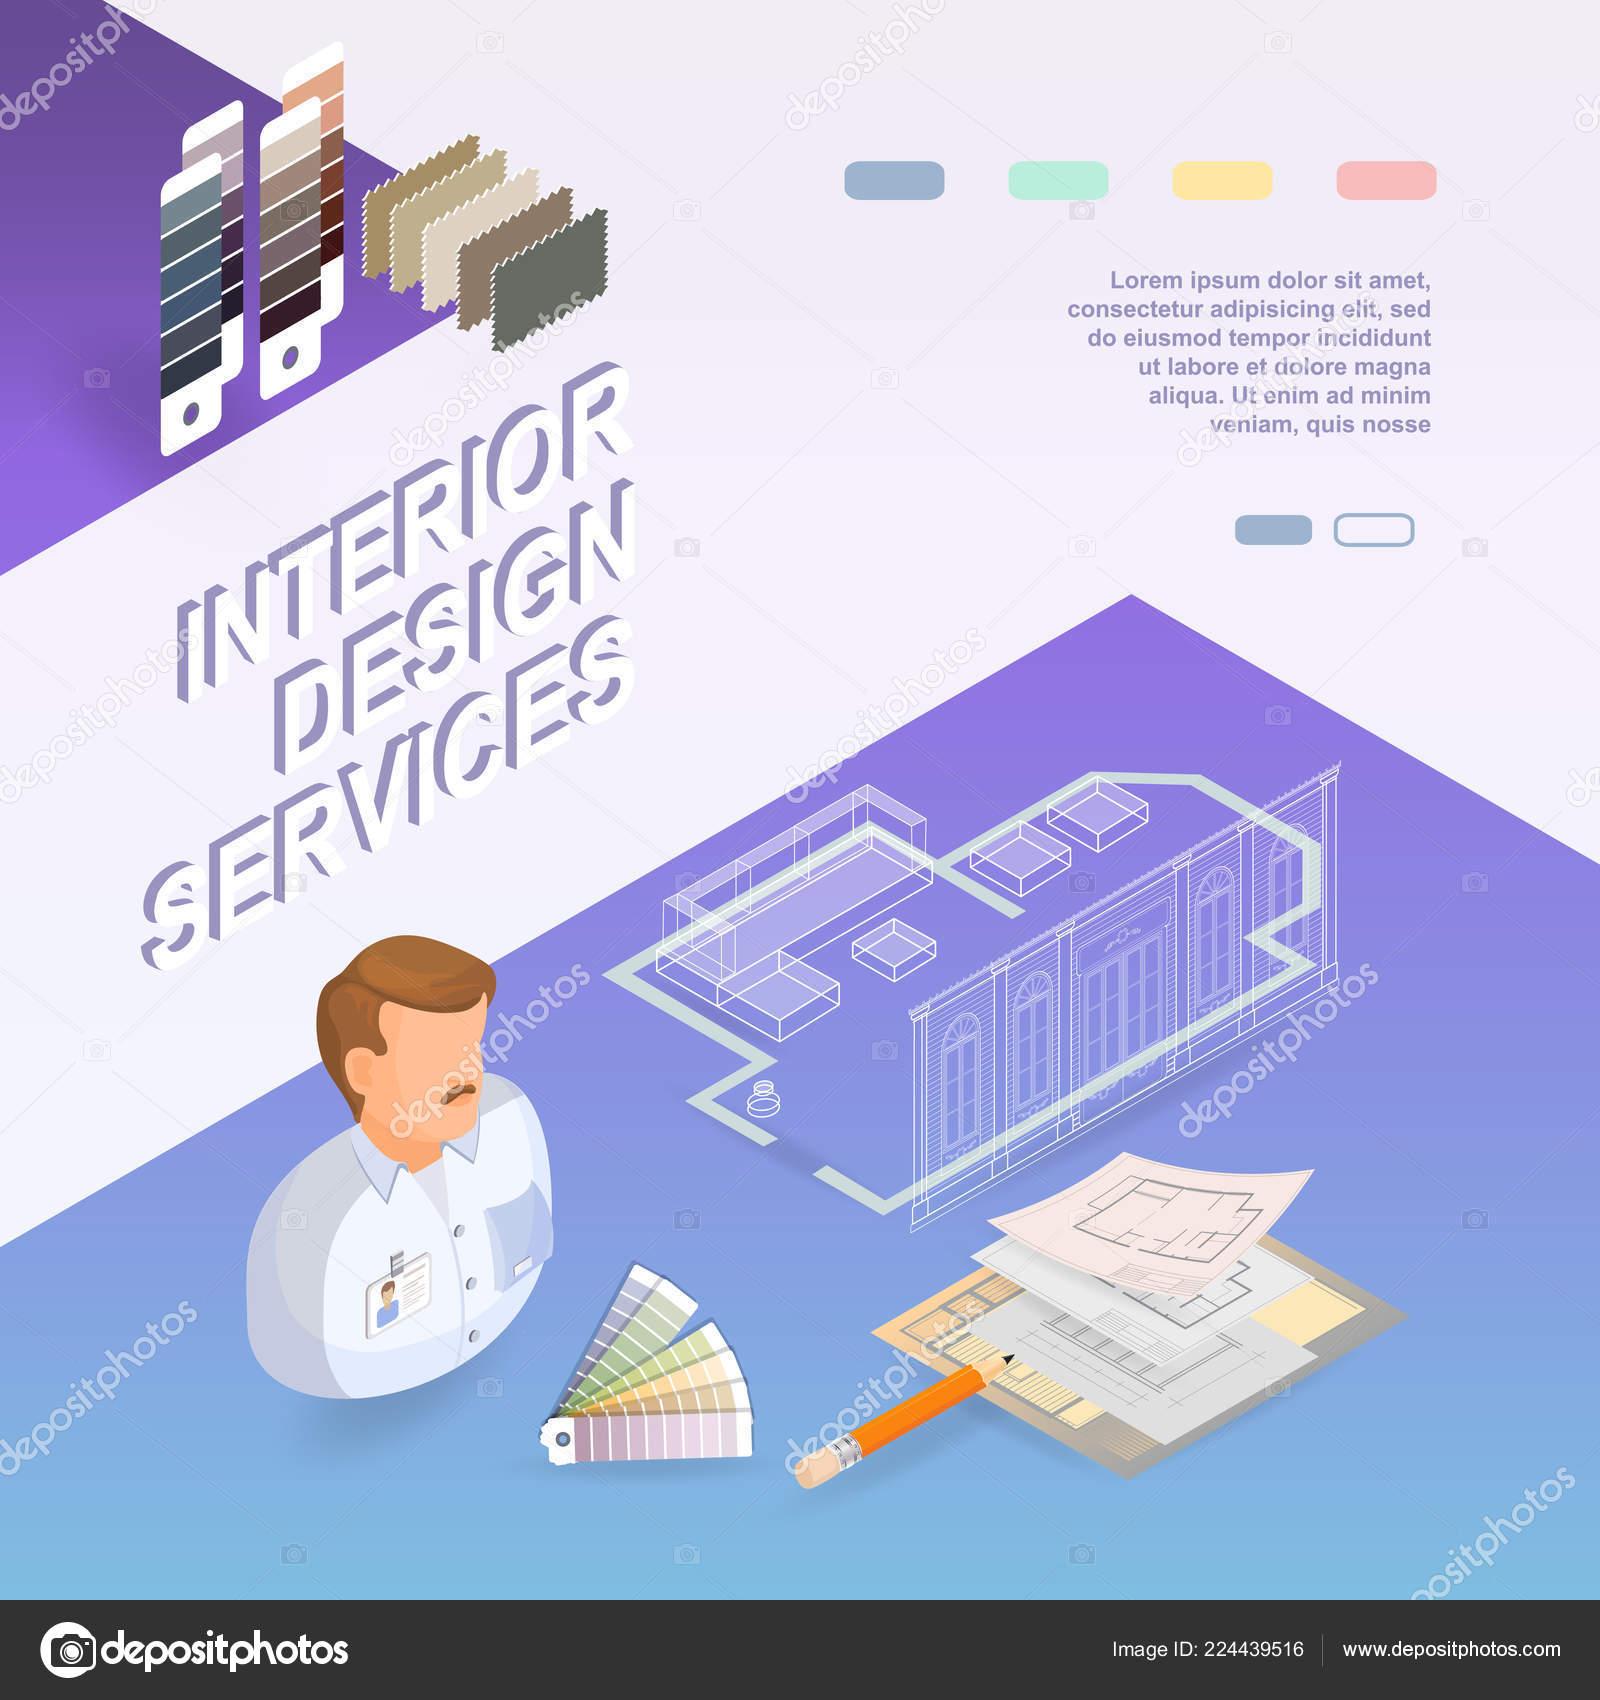 Interior Design Services Isometric Project Repairs Concept Designer Samples  Palettes U2014 Stock Vector